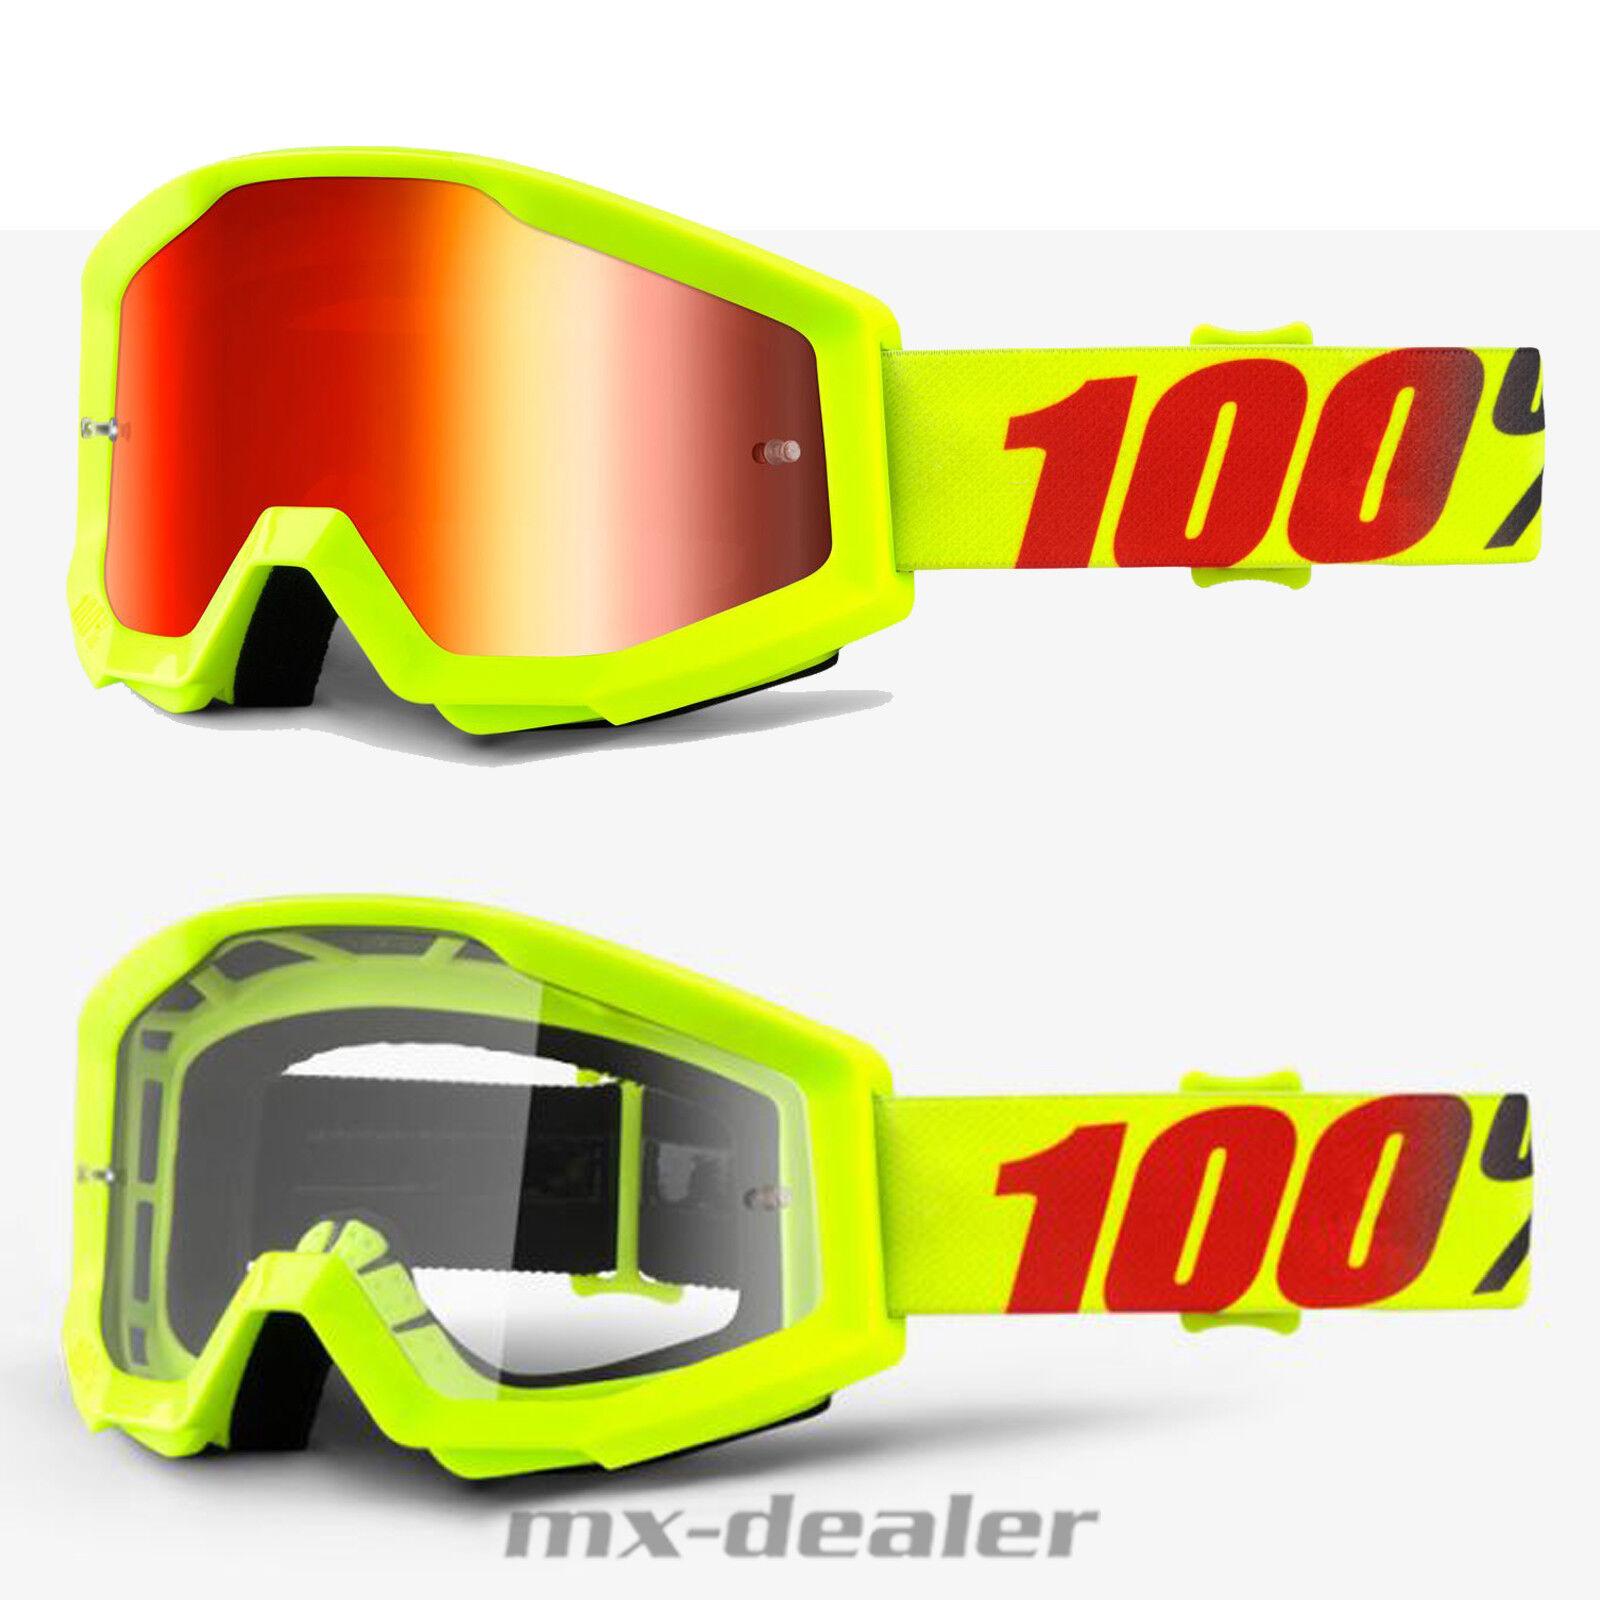 100 % Prozent Brille Strata Mercury fluo yellow Motocross Enduro Downhill Cross